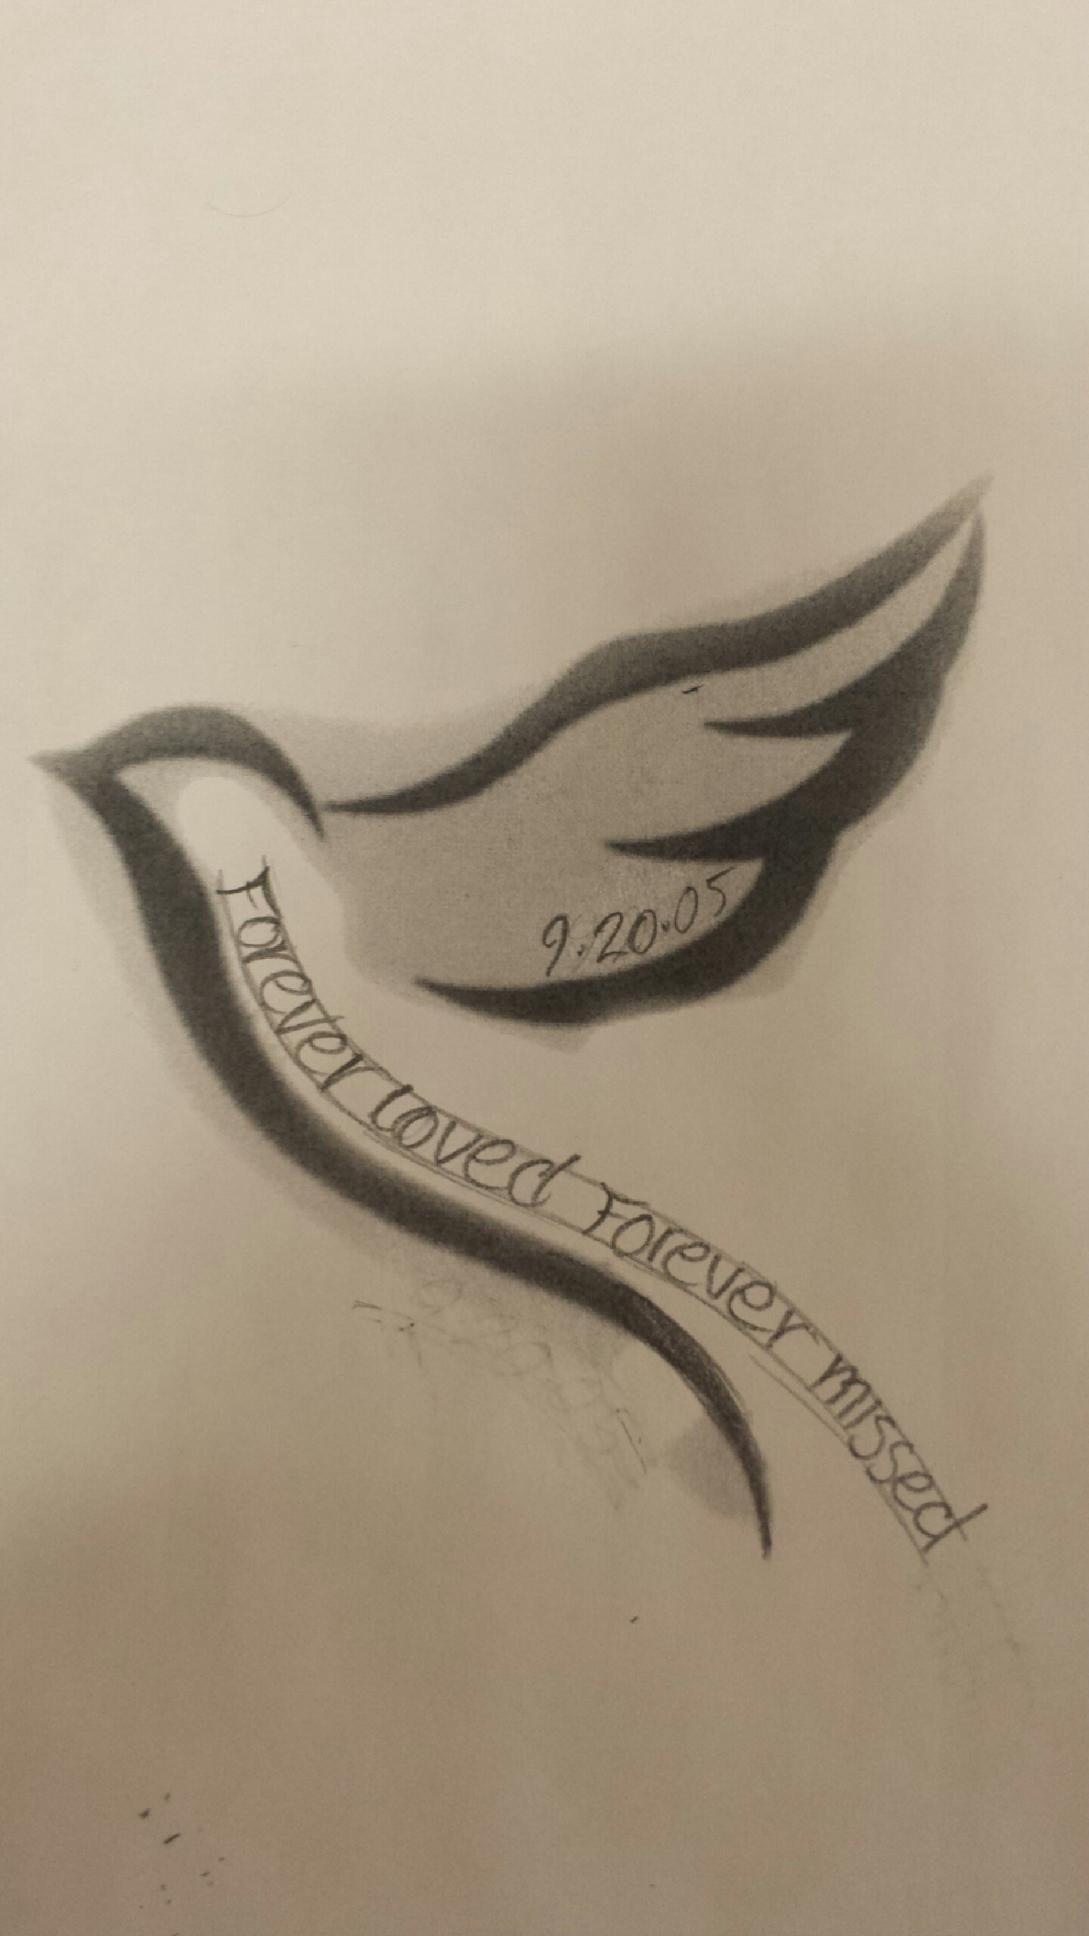 Perdu tatouages and id es de tatouages on pinterest - Tatouage amour perdu ...